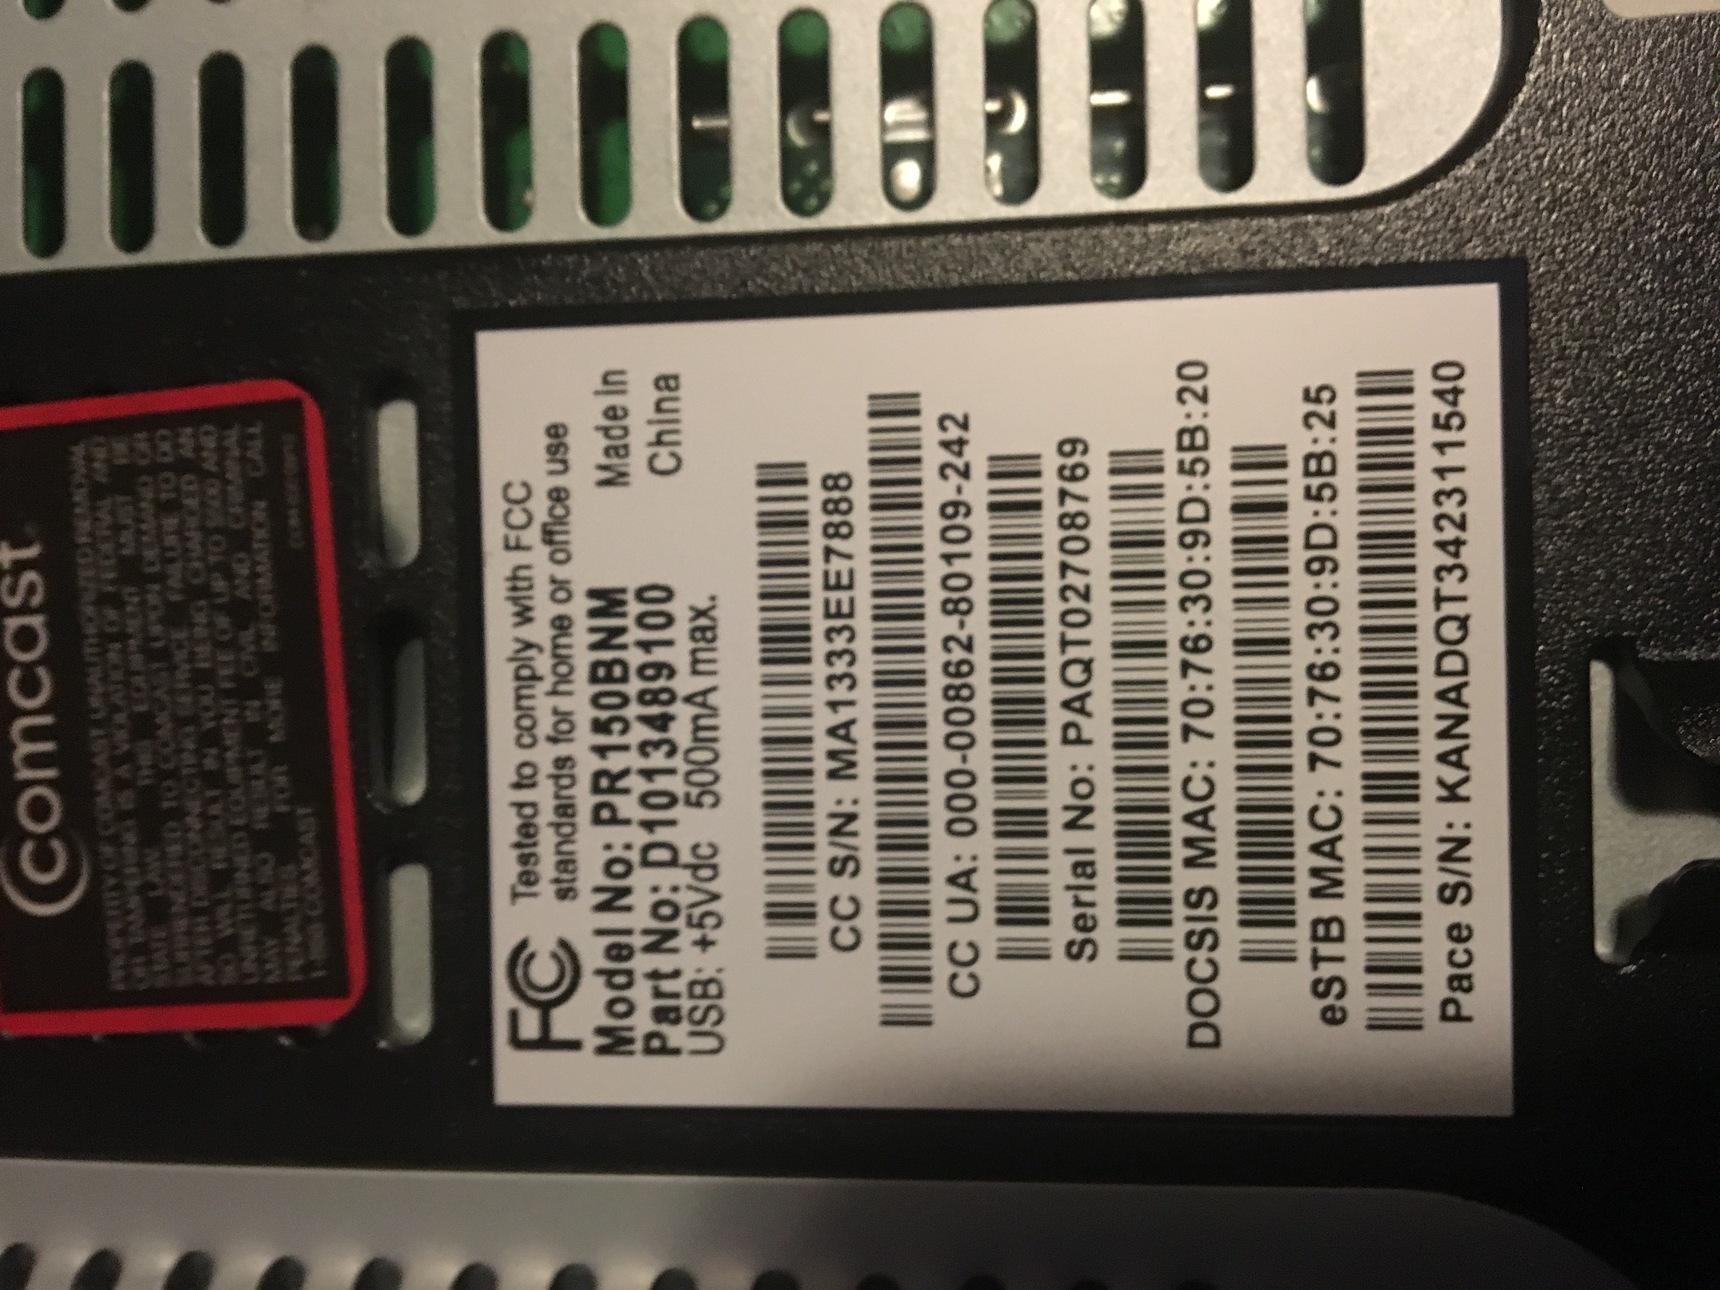 Comcast X1 cable box unusable - Device Specific - Planet NEEO